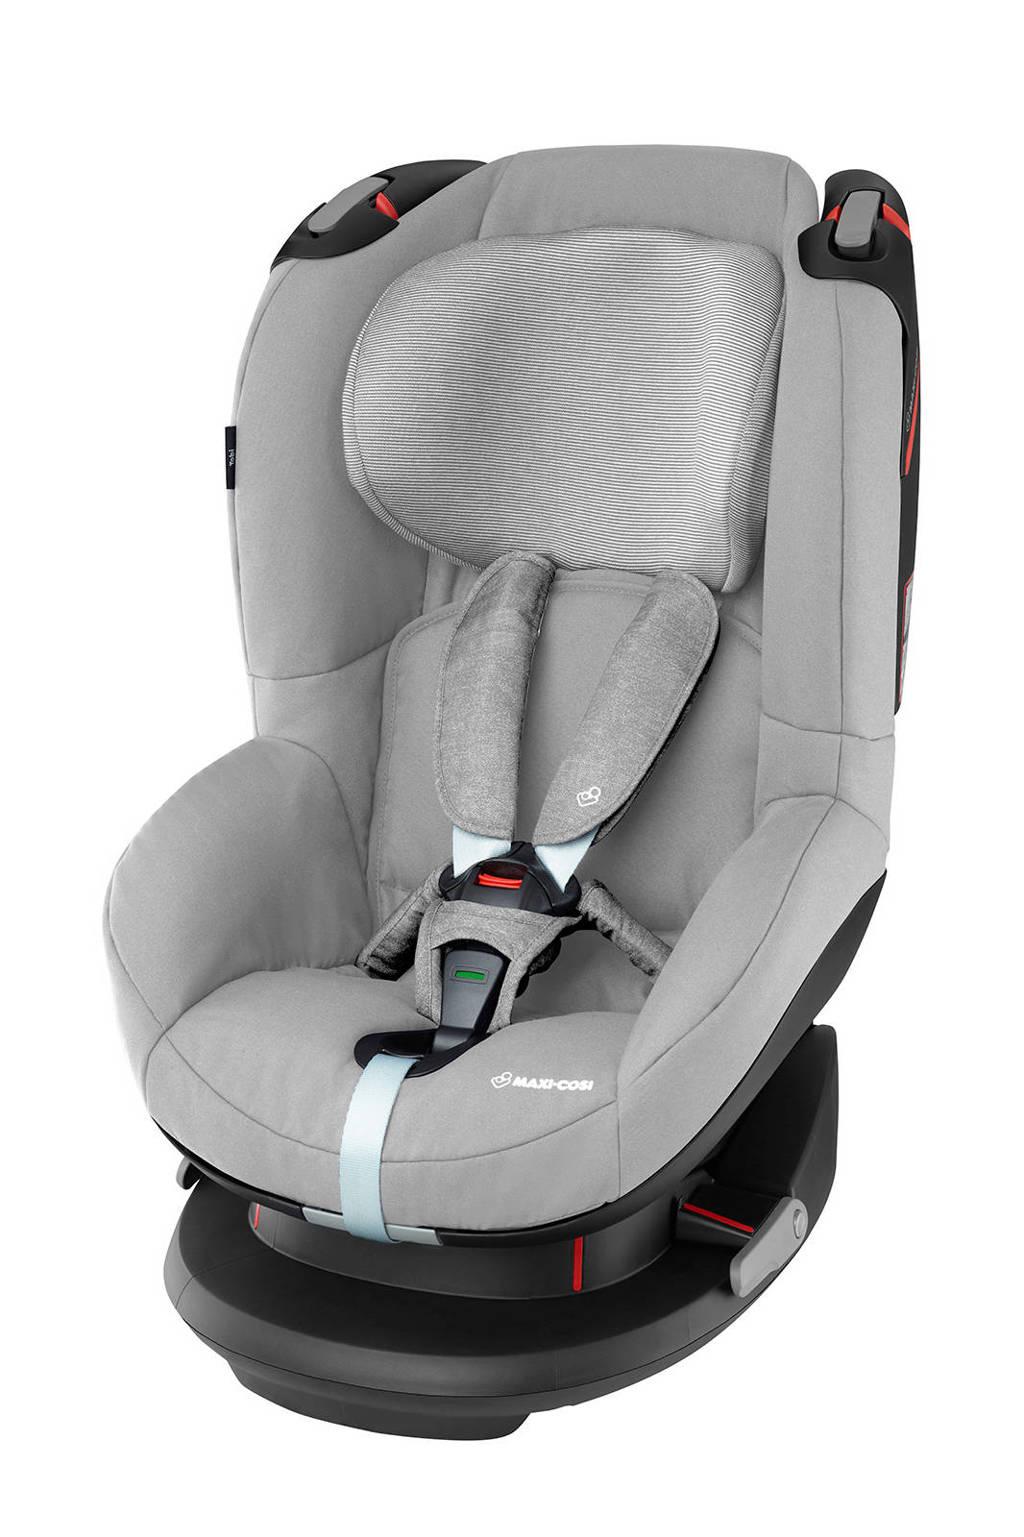 Maxi-Cosi Tobi autostoel Nomad Grey